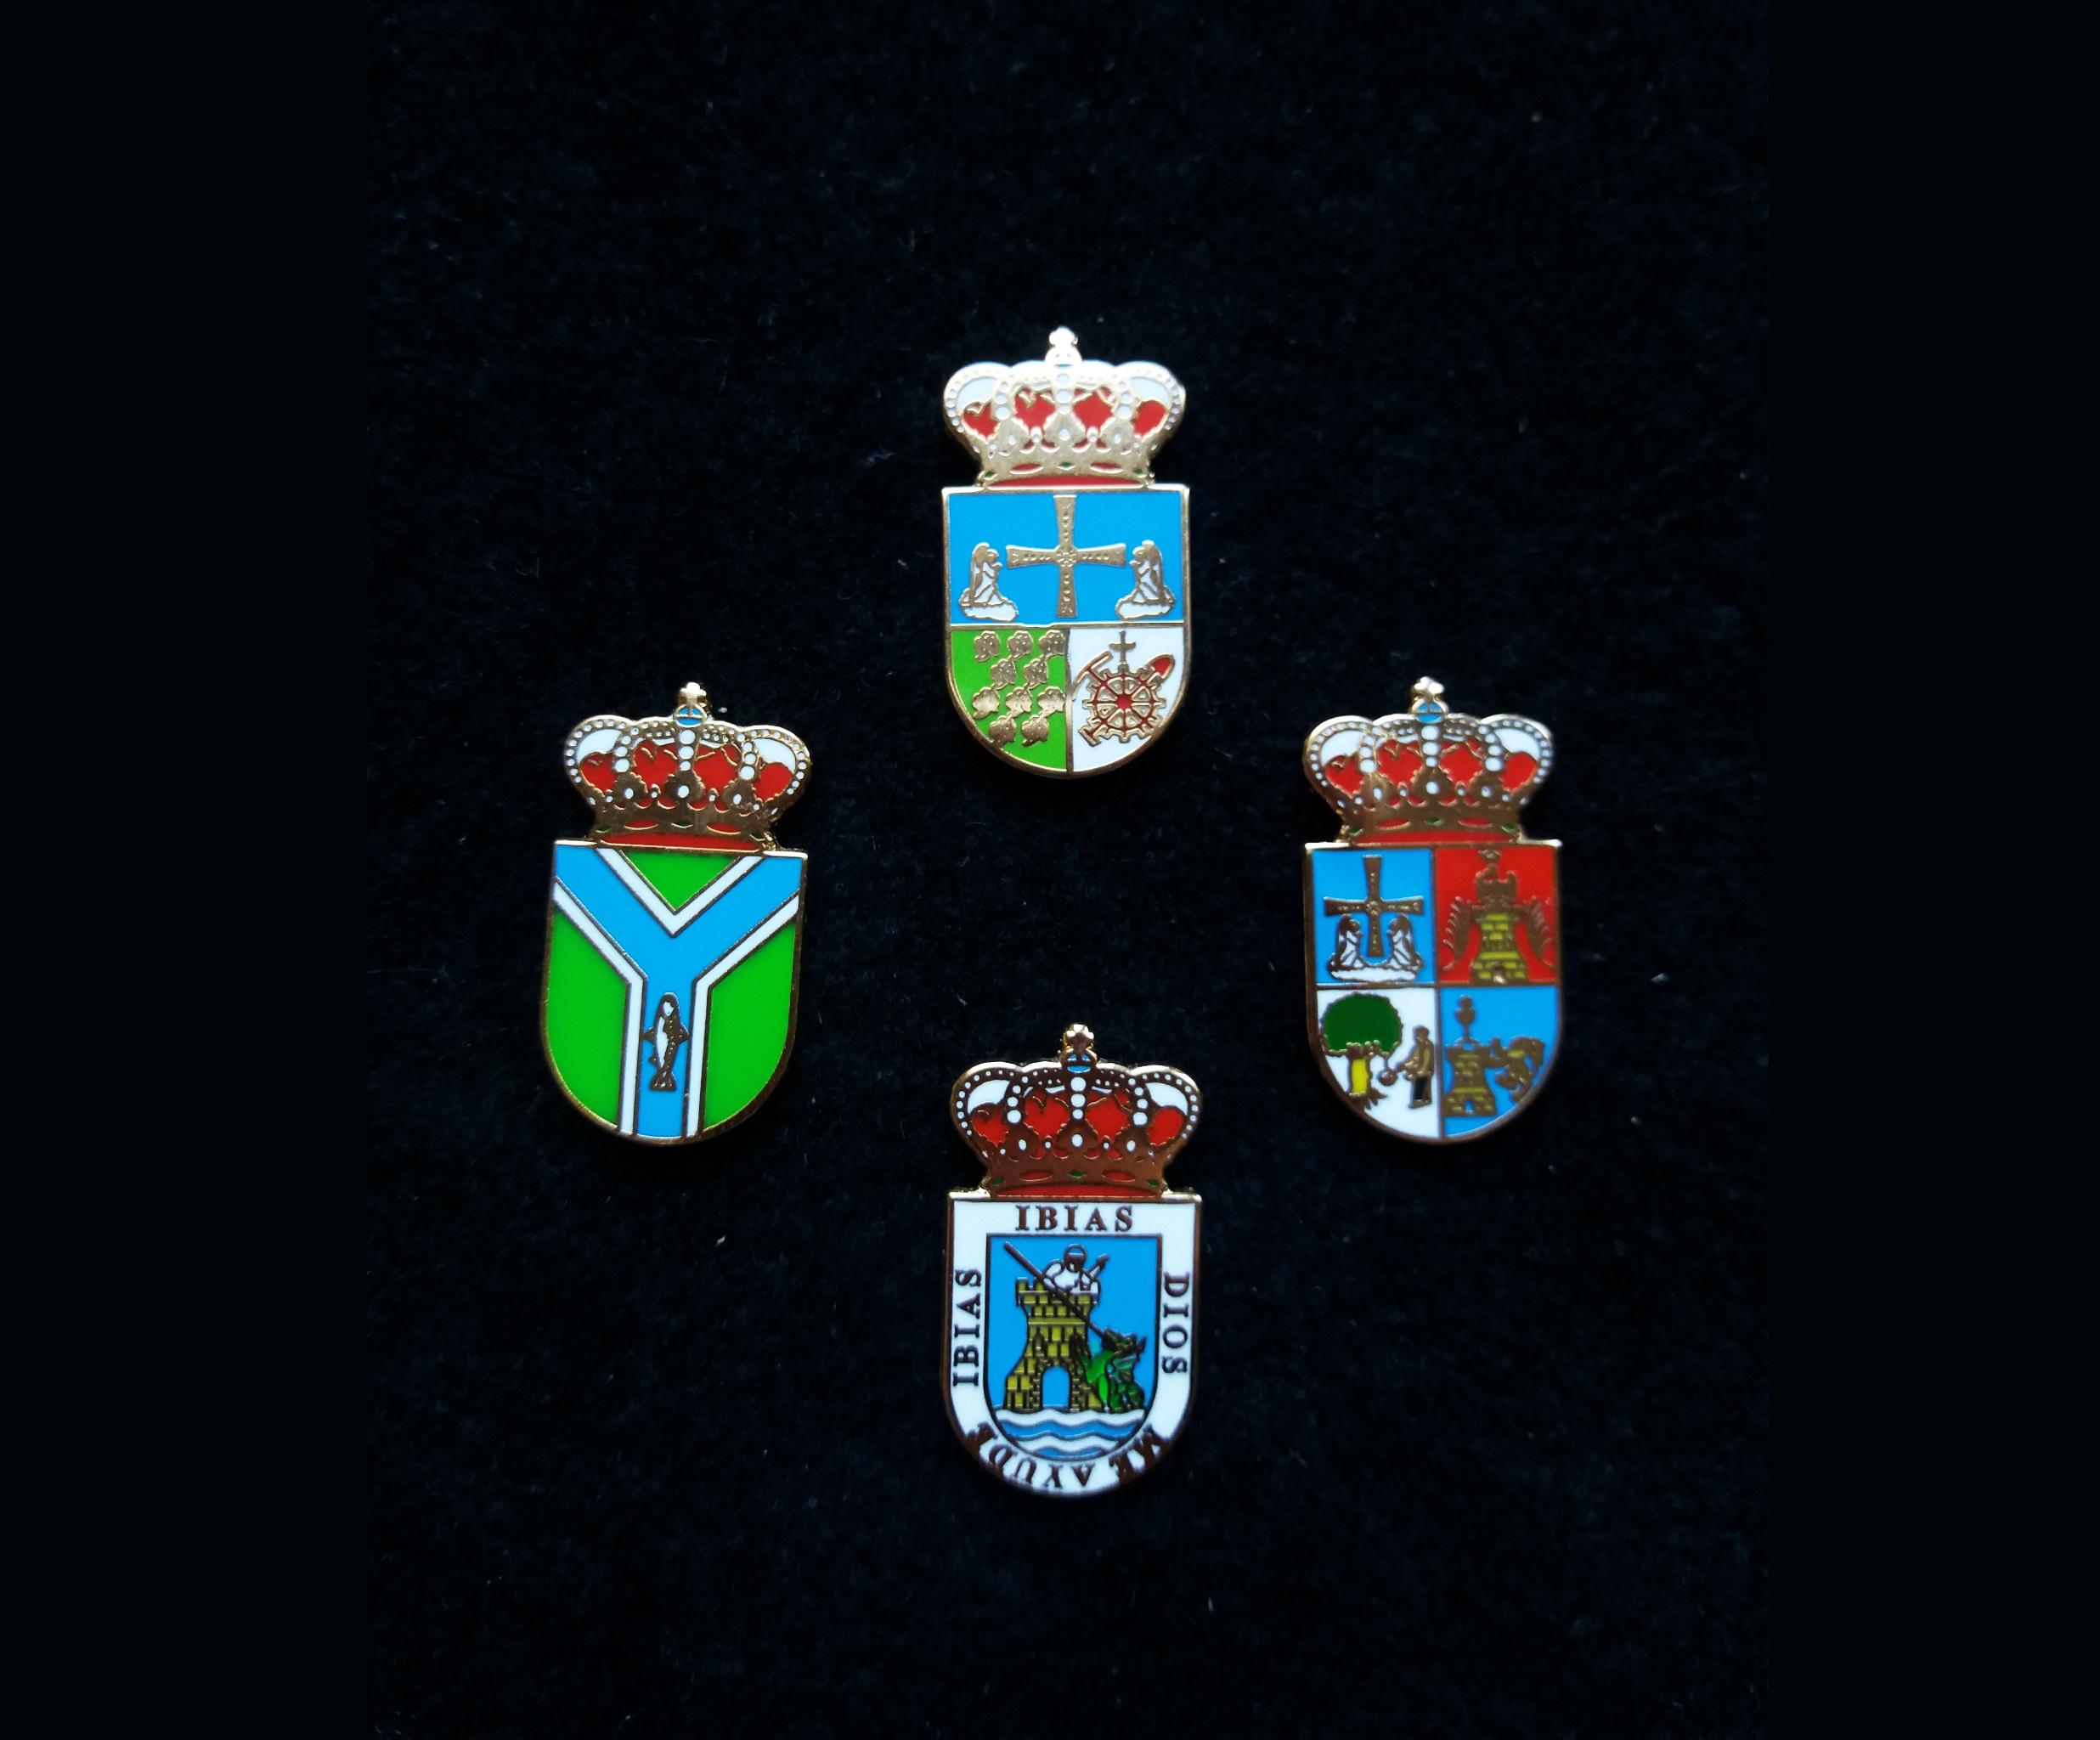 Langreo, Ribera de Arriba, Ibias and Illano heraldic pins